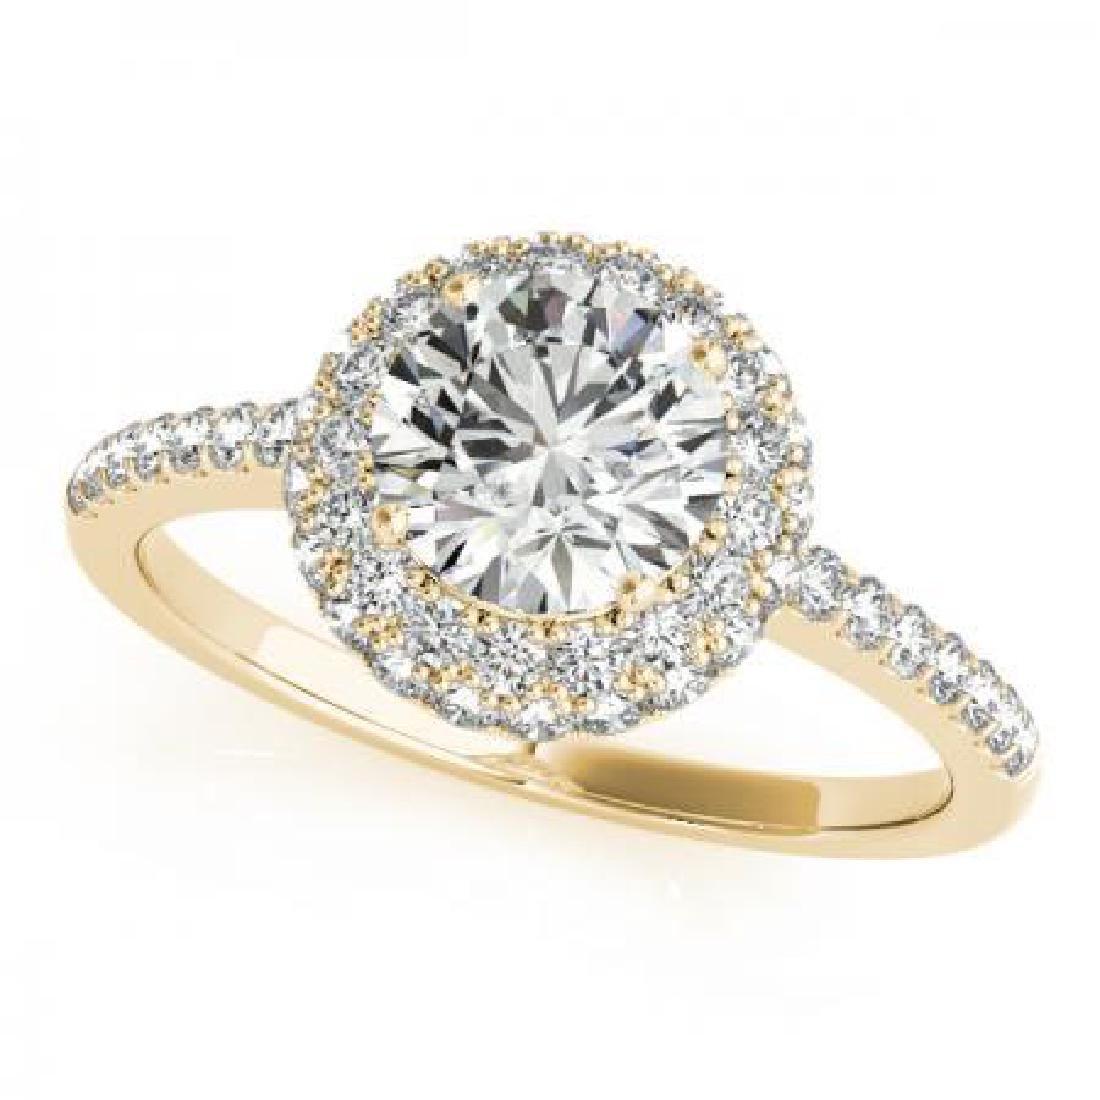 CERTIFIED 18K YELLOW GOLD 1.84 CT G-H/VS-SI1 DIAMOND HA